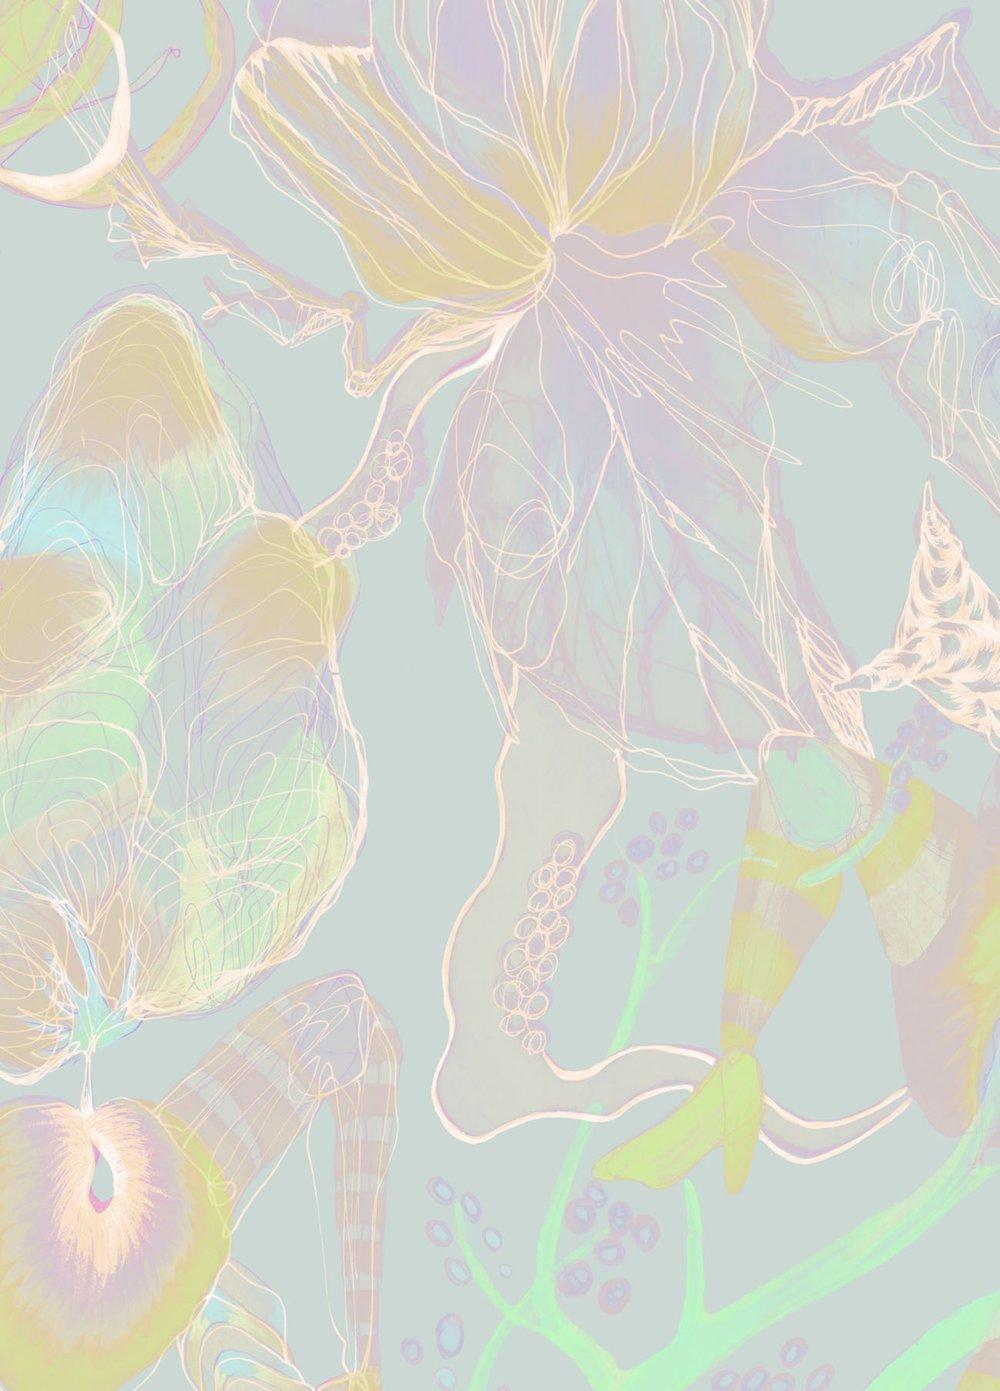 Morbid Fairy Tale Wallpaper